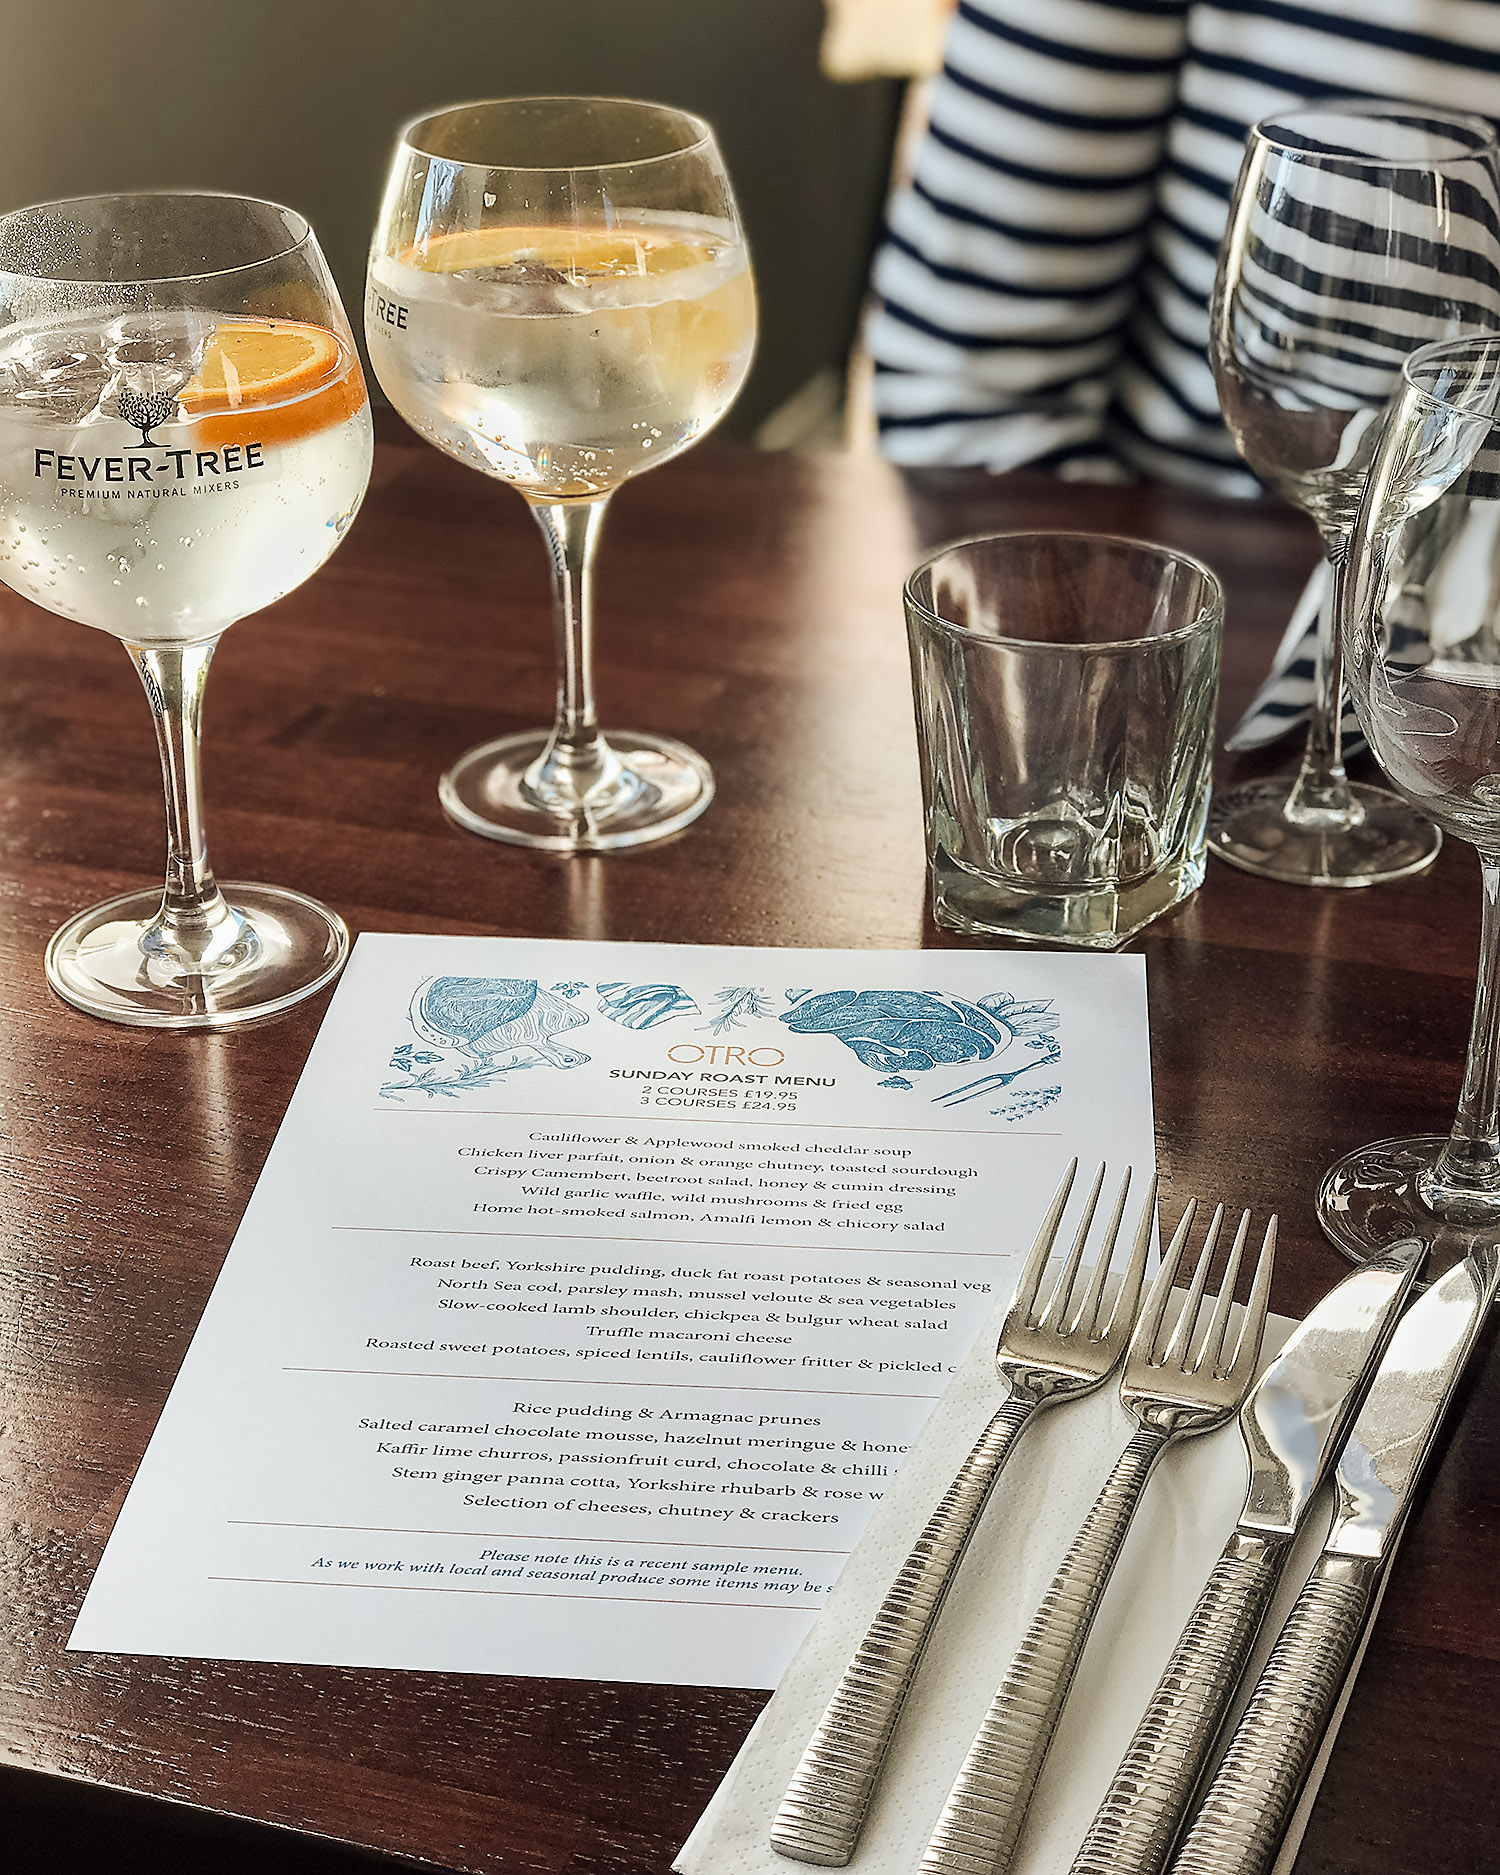 Sunday lunch menu at Otro restaurant Edinburgh